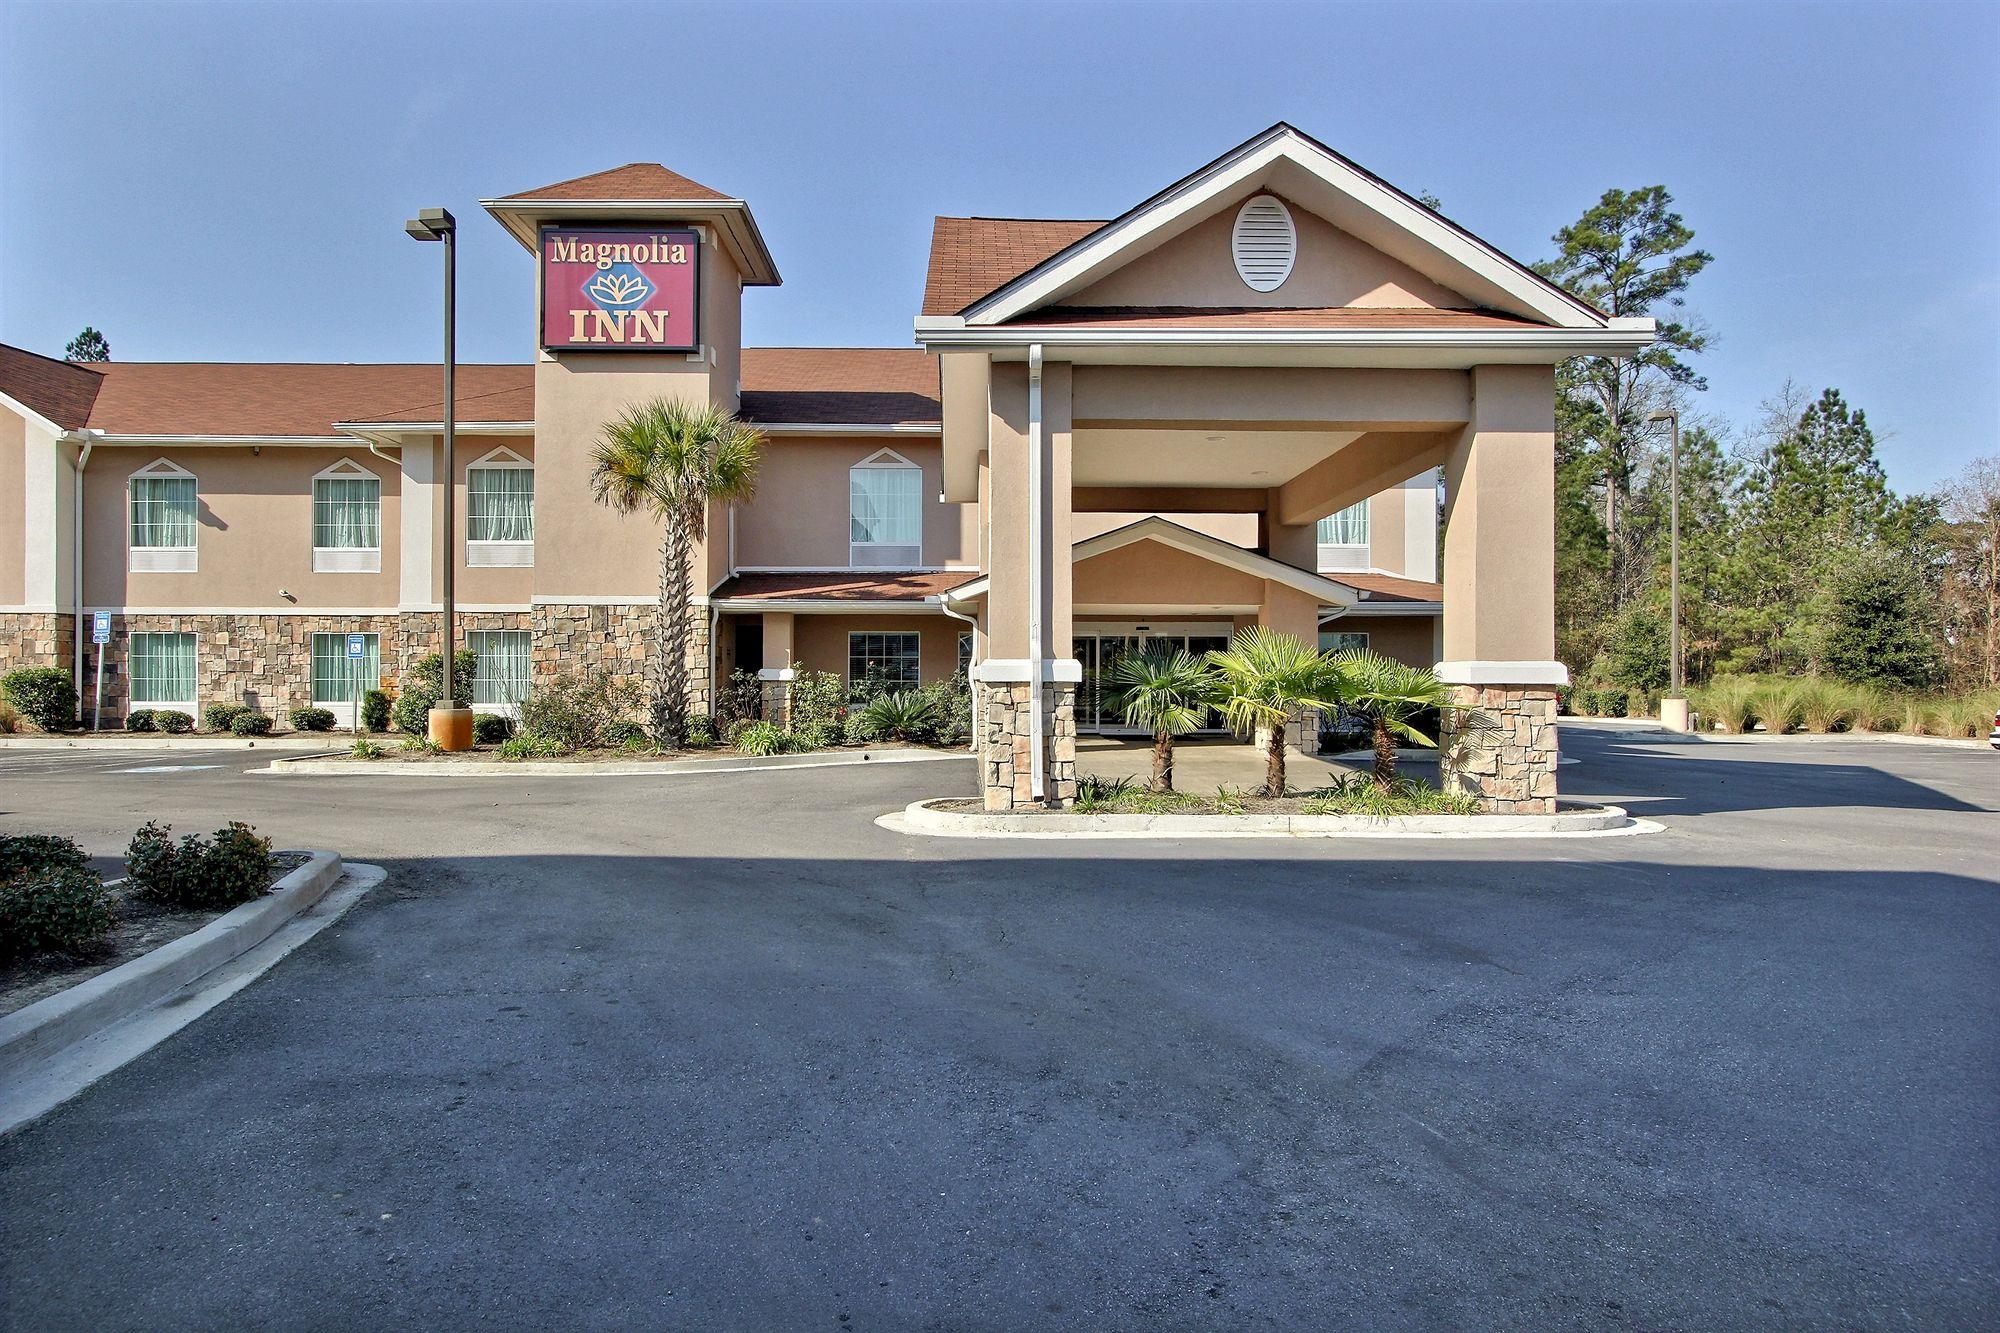 Magnolia Inn in Pooler, GA